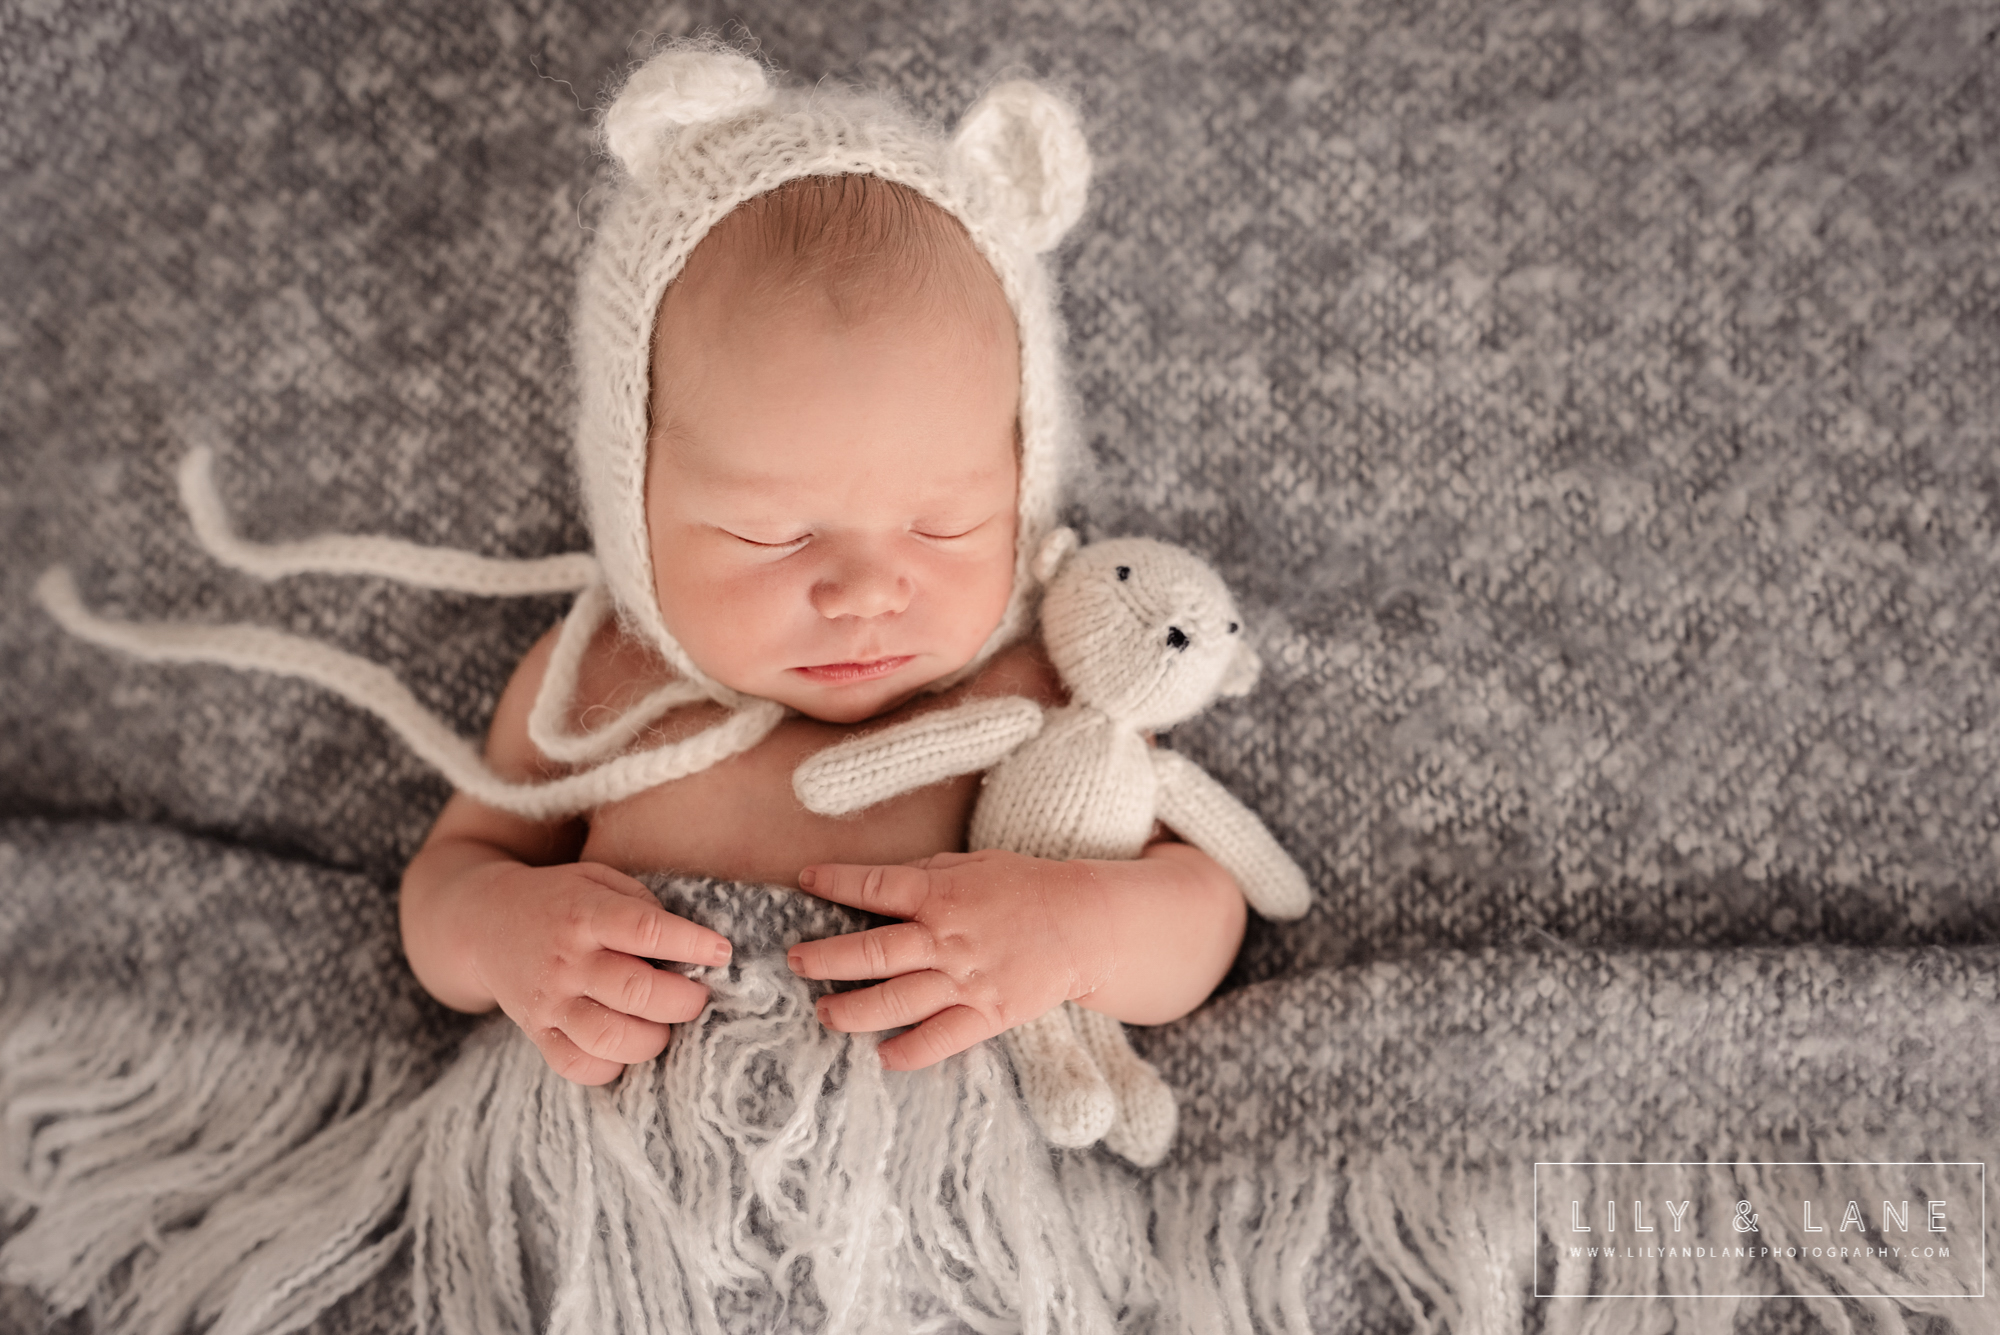 LilyandLane_VictoriaBC_NewbornPhotographer (49).jpg